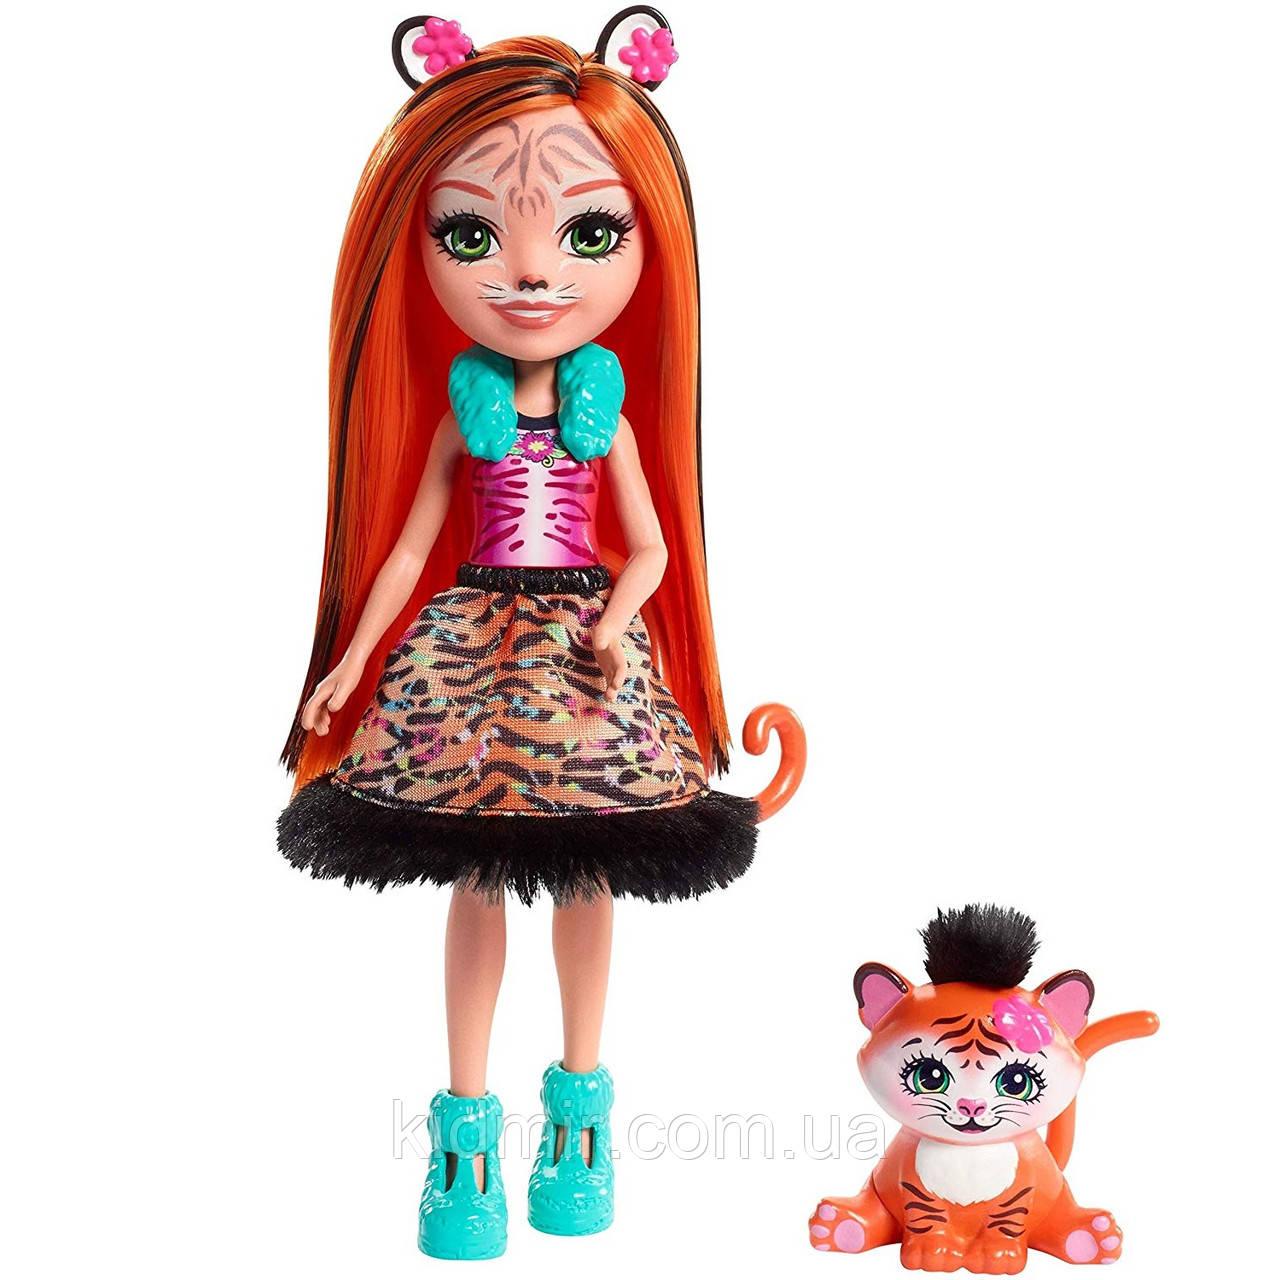 Кукла Enchantimals тигр Тензи Тигра Тайгер с питомцем FRH39